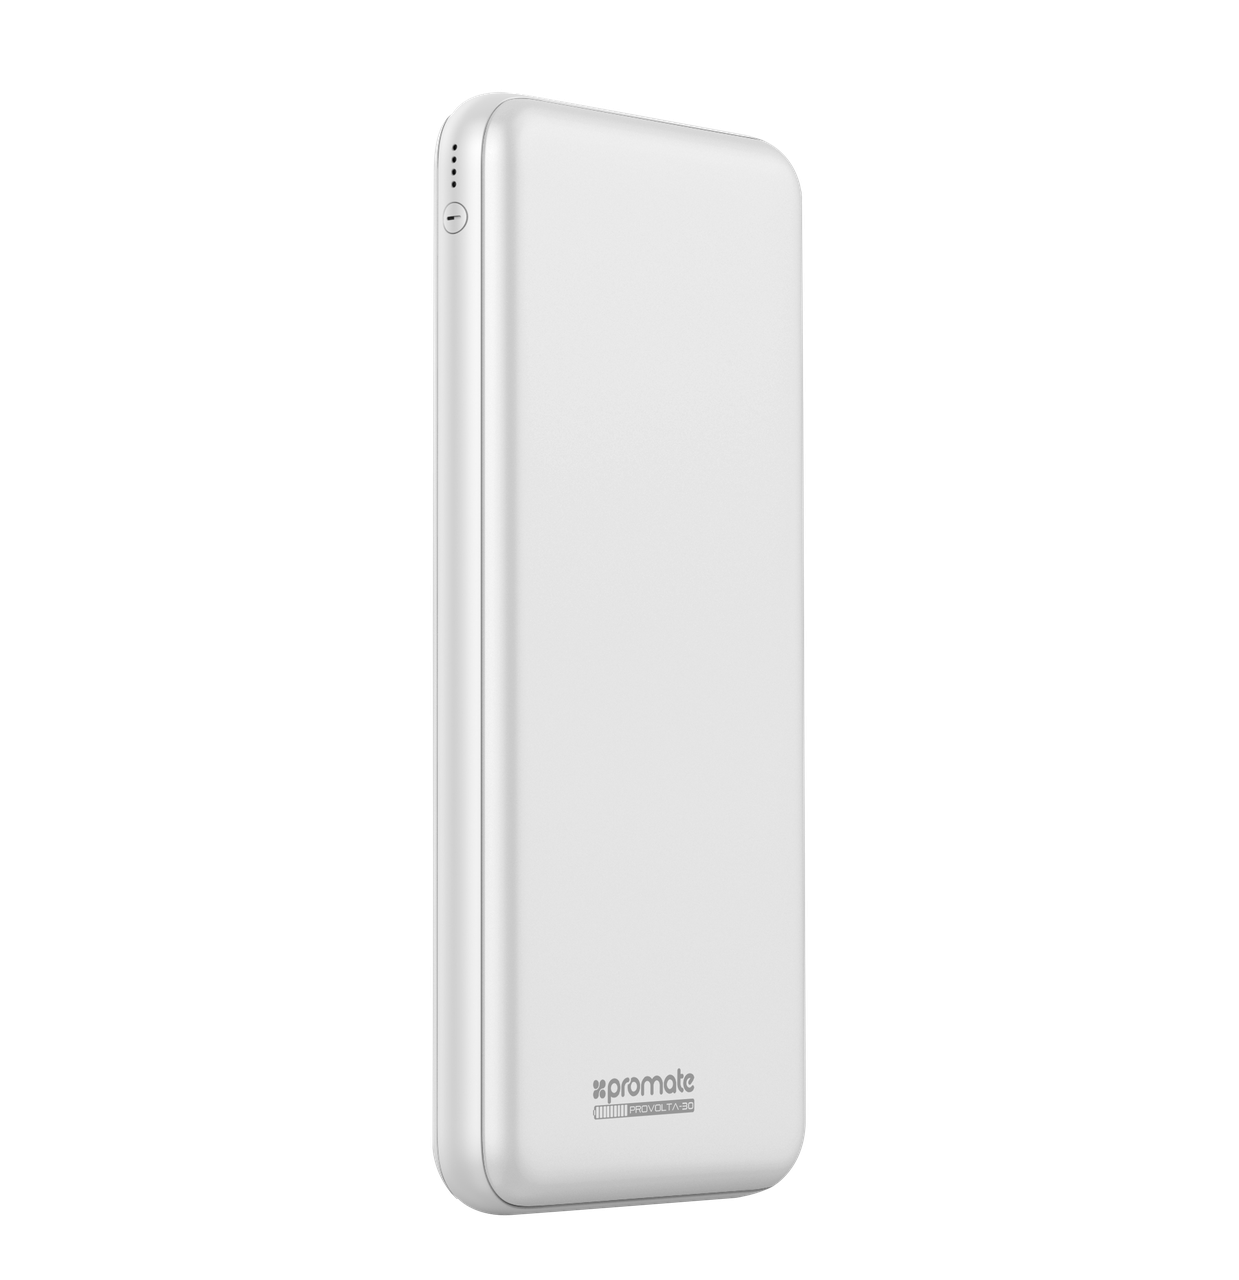 Аккумулятор Promate proVolta-30 White